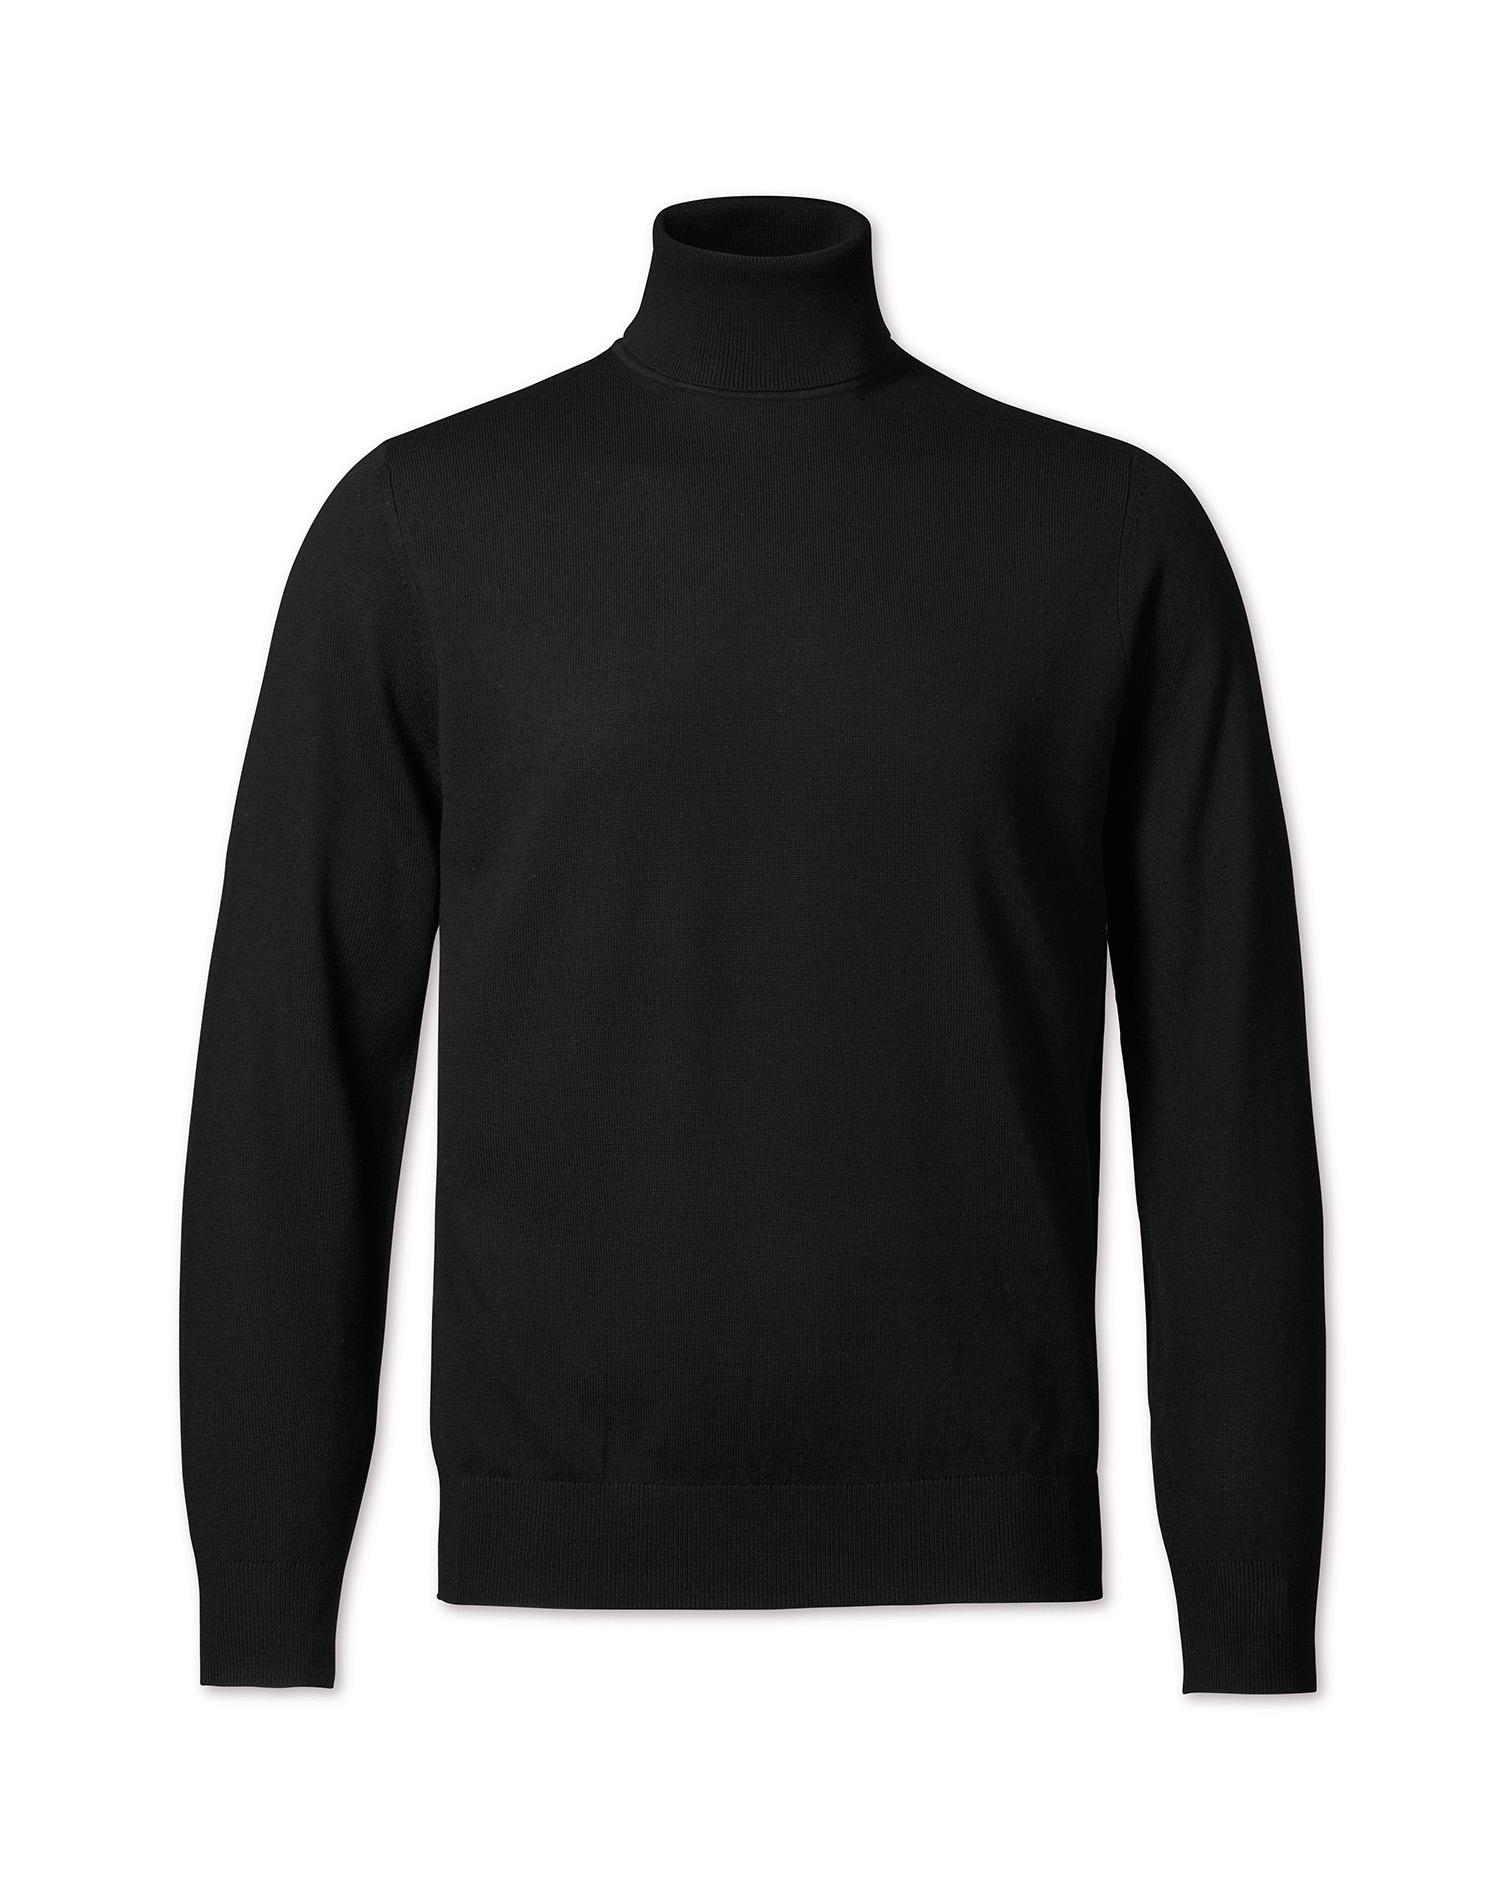 03e43c2cf52 Black merino wool roll neck jumper